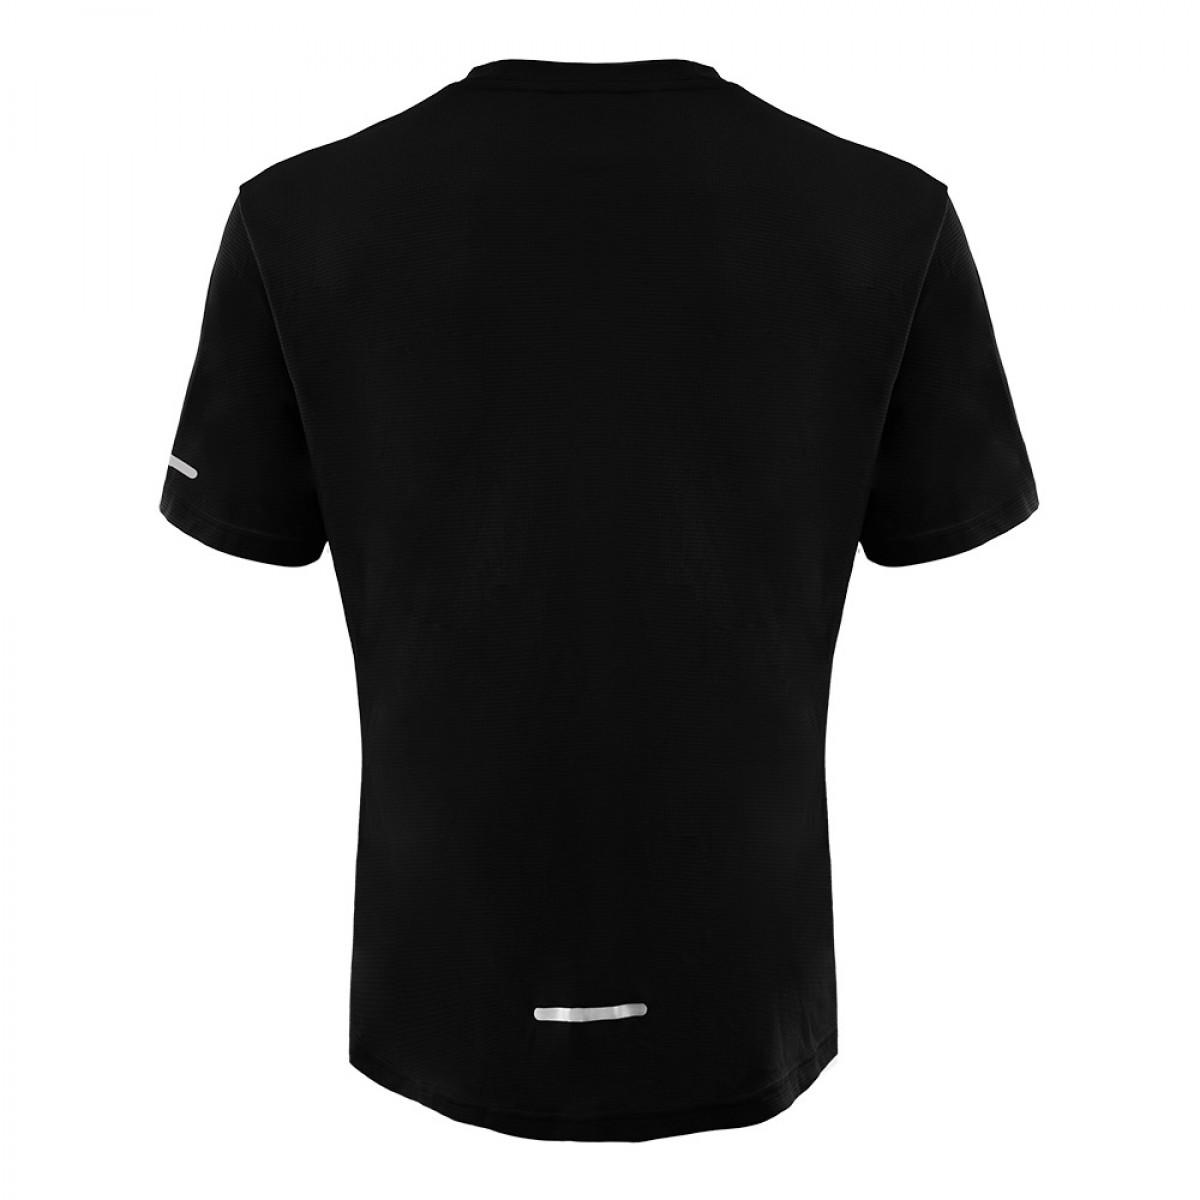 men-knitted-round-neck-logo-t-shirt-kkrnlt15935-8a